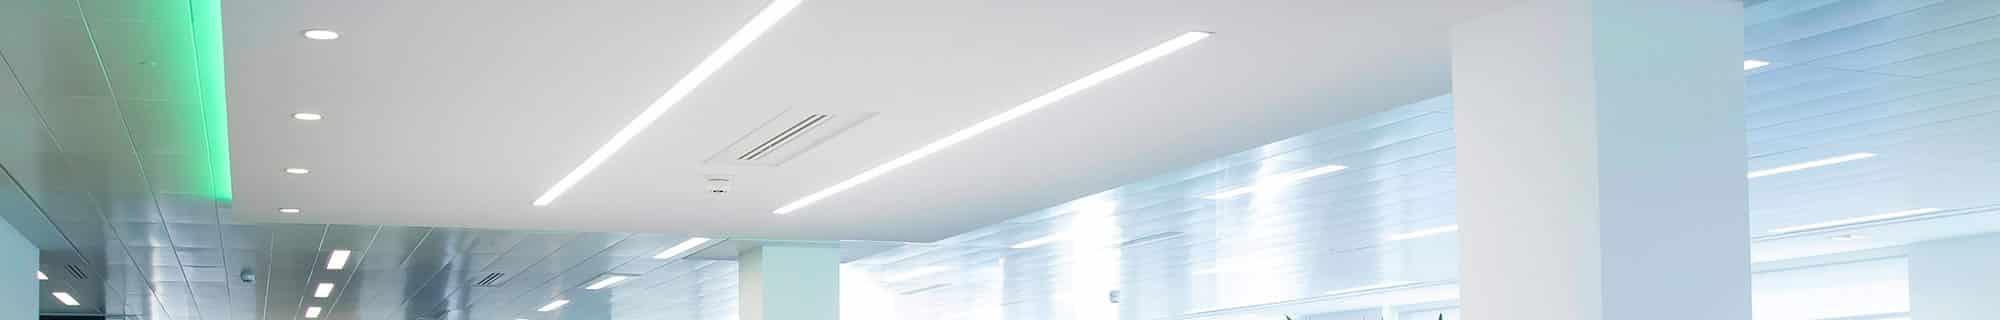 Generic mount lighting Banner image